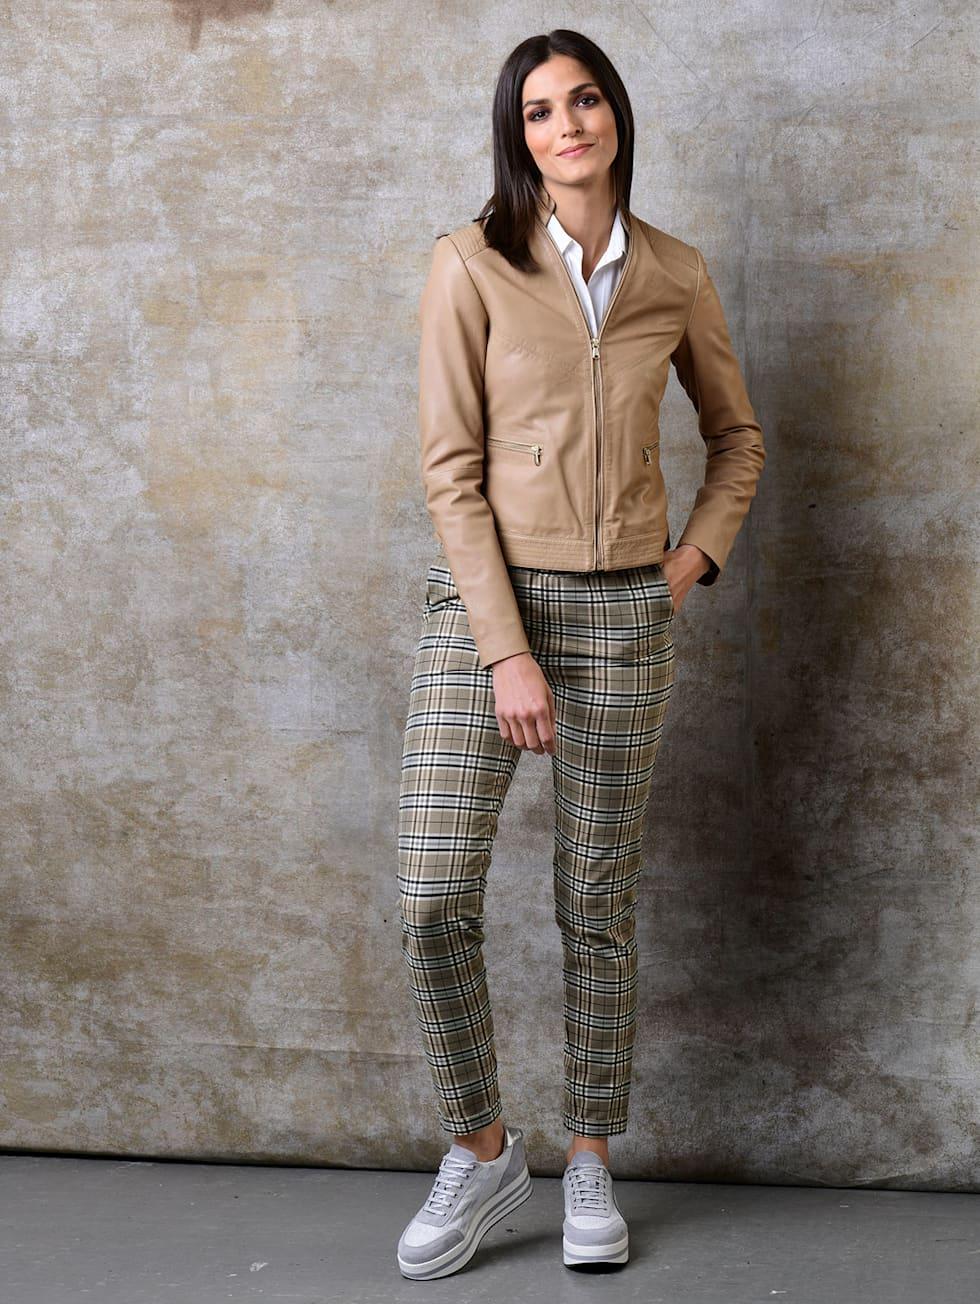 HW21_Outfitteaser_Luxury Neutrals_1